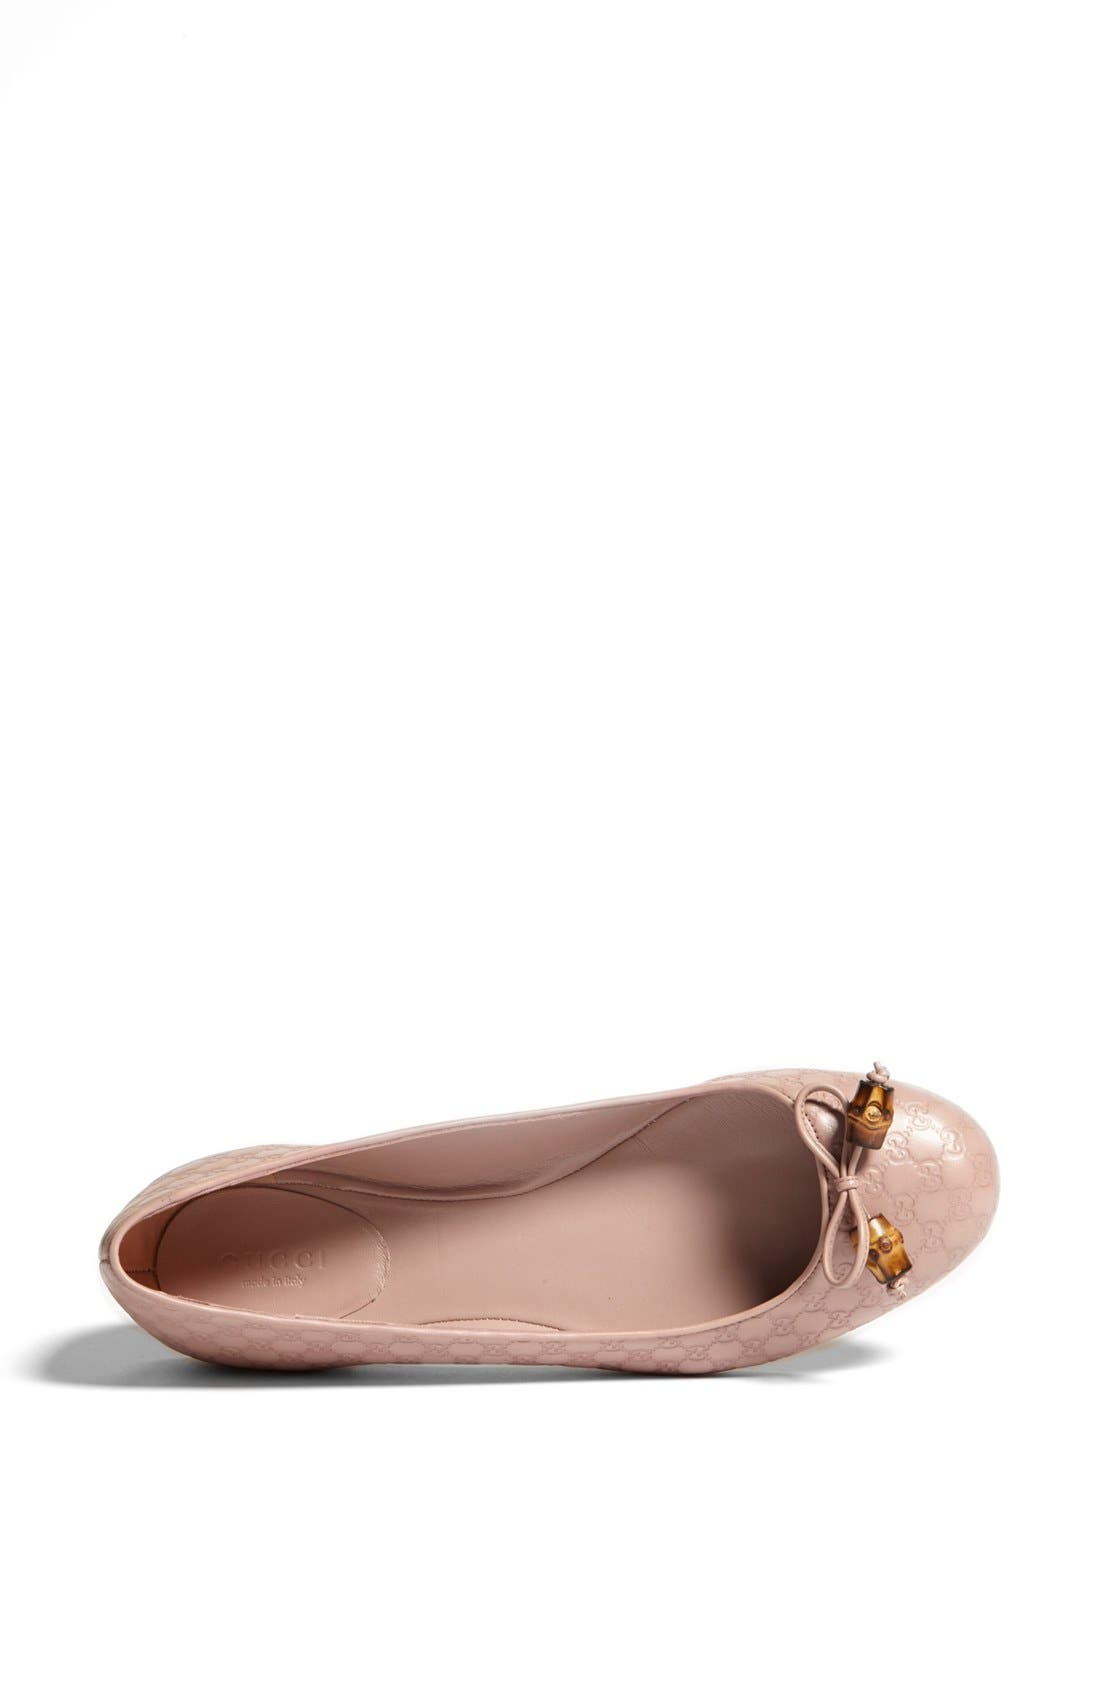 Alternate Image 3  - Gucci 'Sylvie' Bamboo Bow Ballet Flat